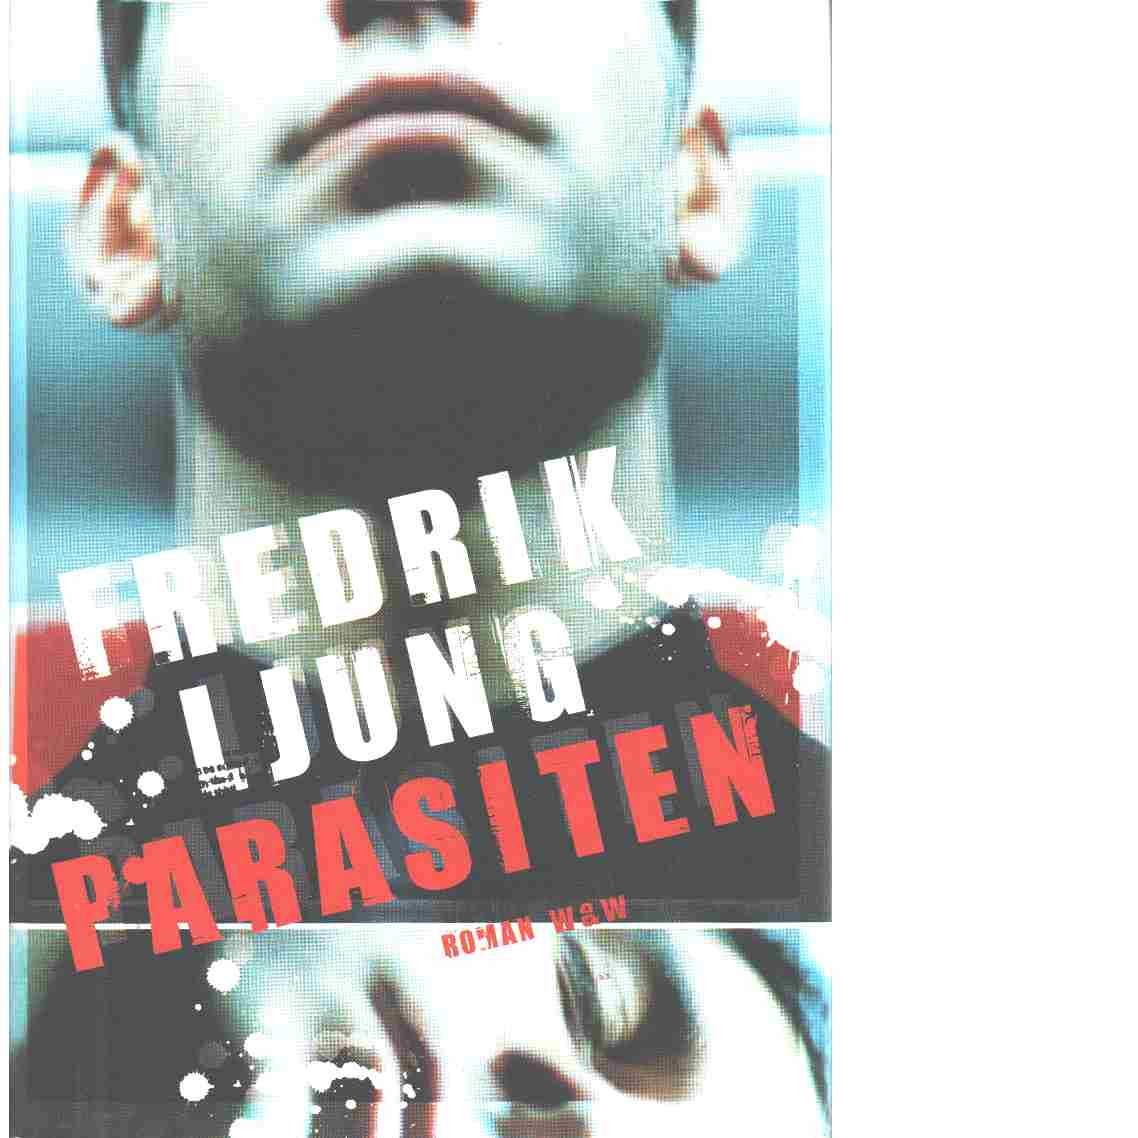 Parasiten - Ljung, Fredrik